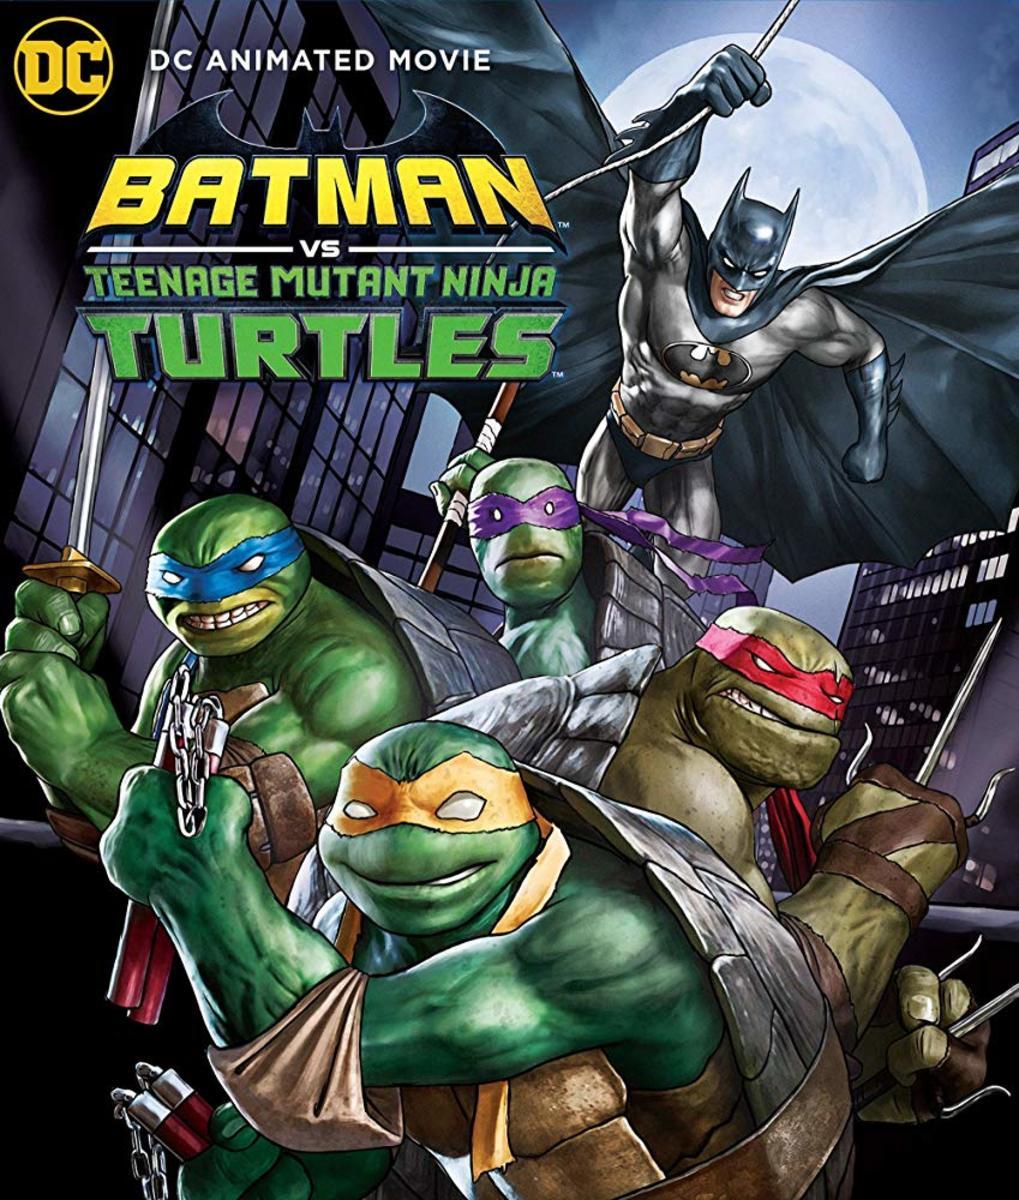 'Batman vs Teenage Mutant Ninja Turtles' (2019) A Tubular Movie Review